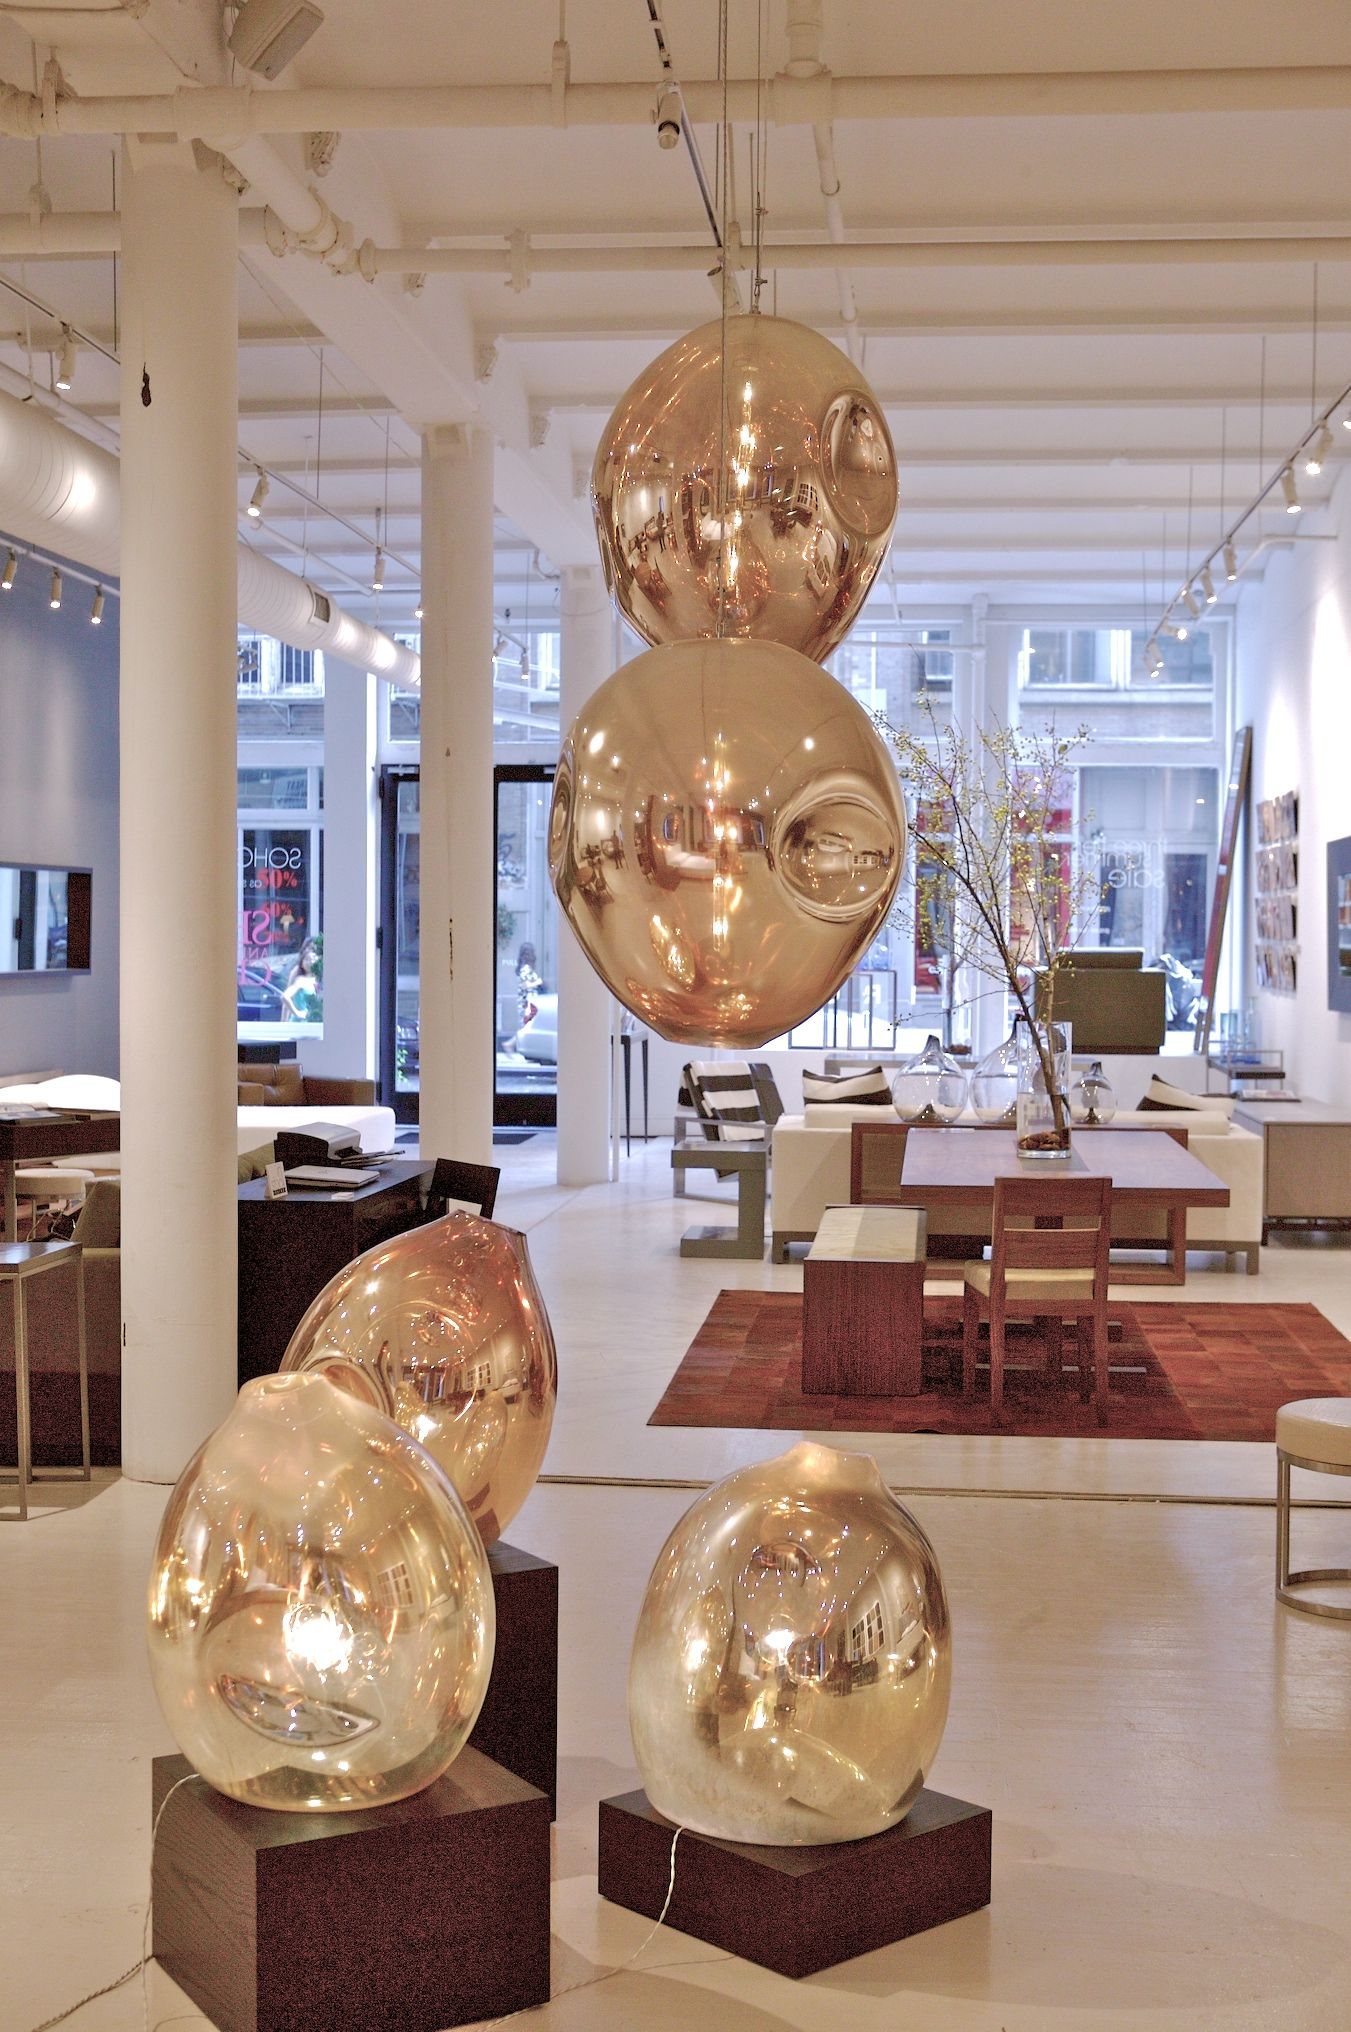 Esque Studio - Enlighten Brands | Table decorations, Decor ...